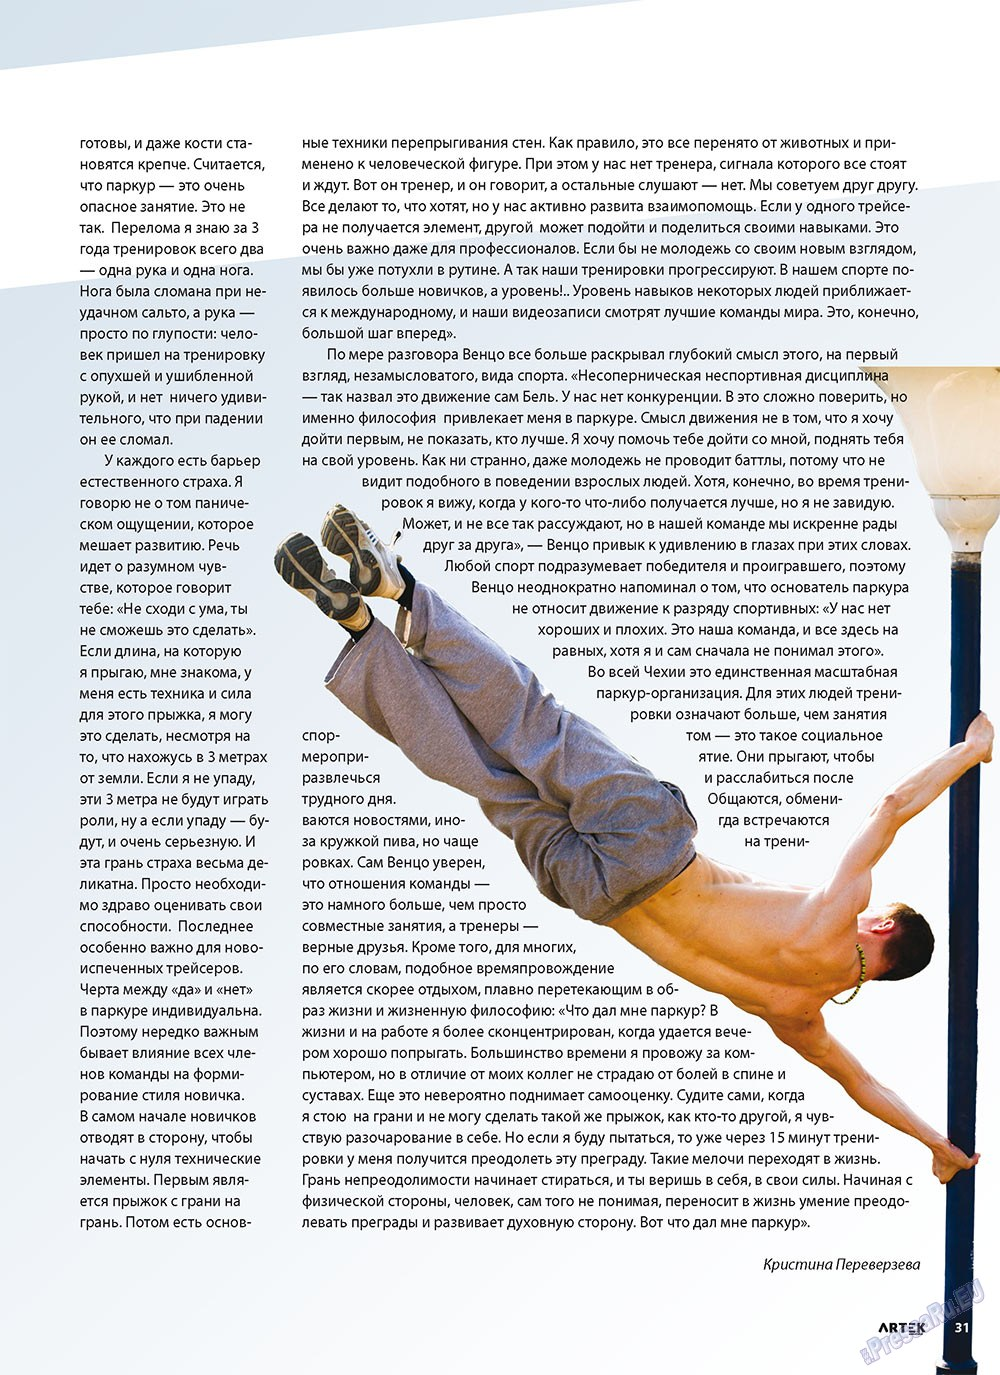 Артек (журнал). 2011 год, номер 2, стр. 33